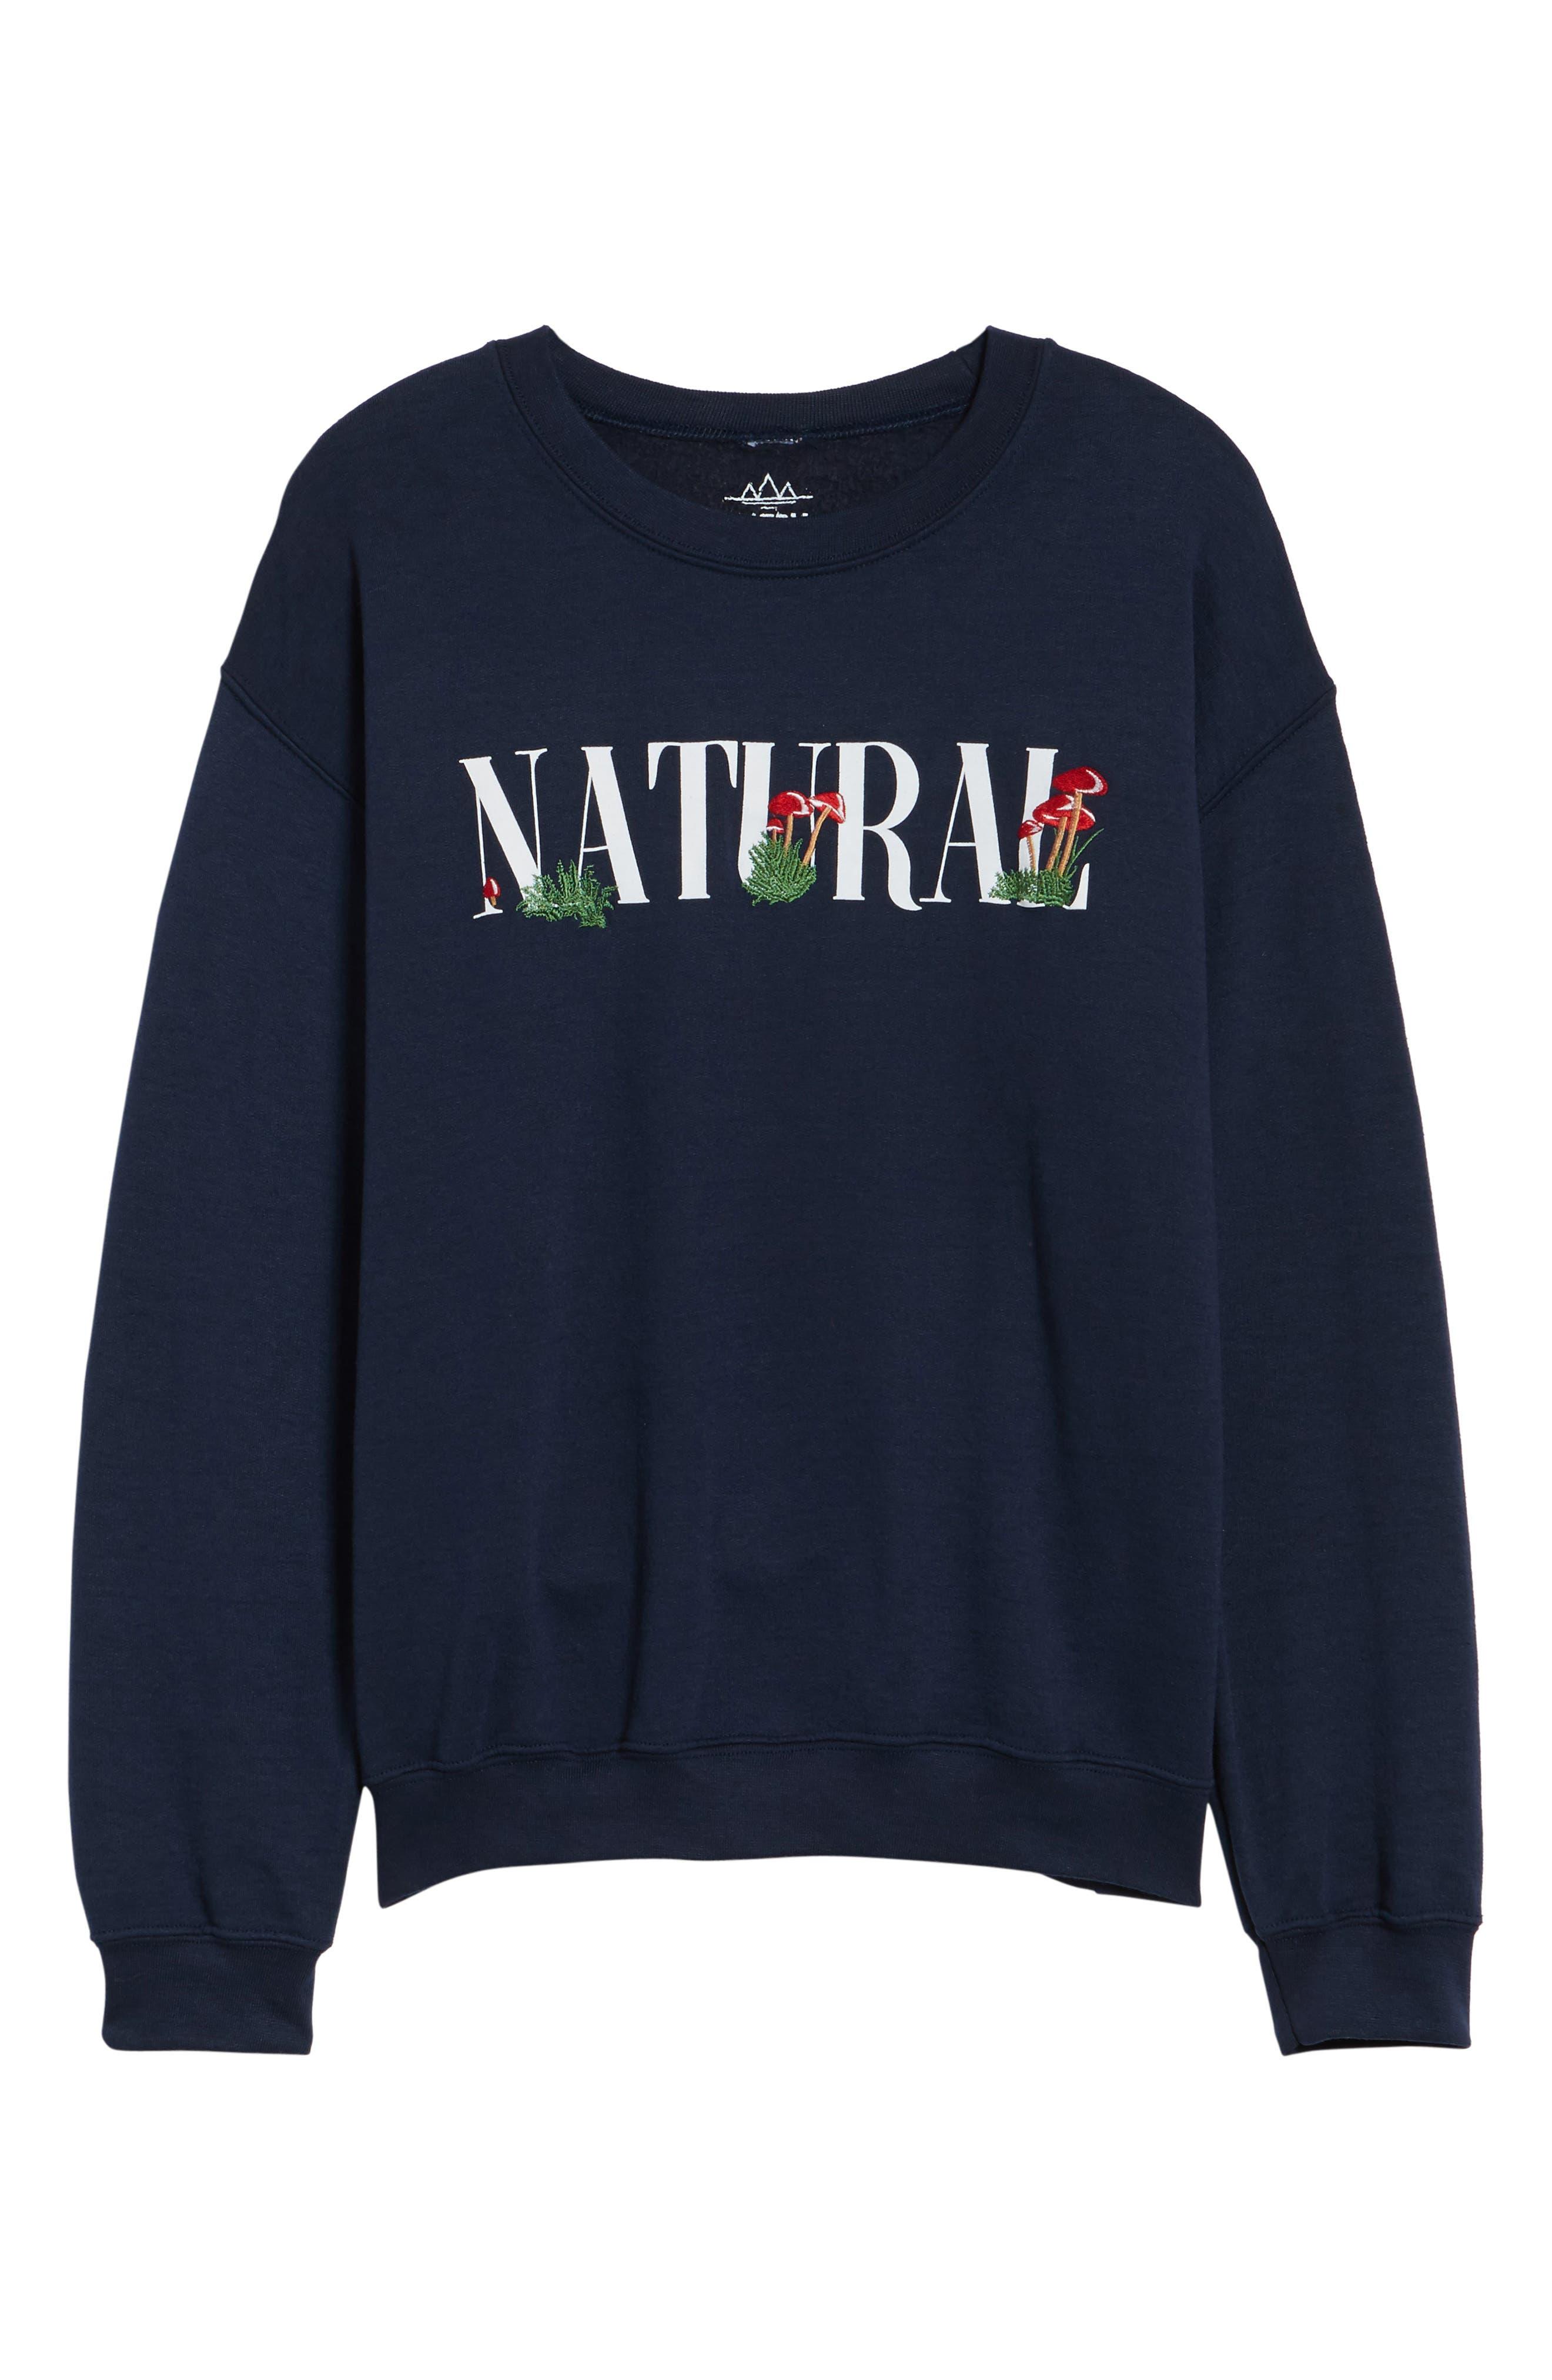 Natural Mushroom Sweatshirt,                             Alternate thumbnail 6, color,                             Blue